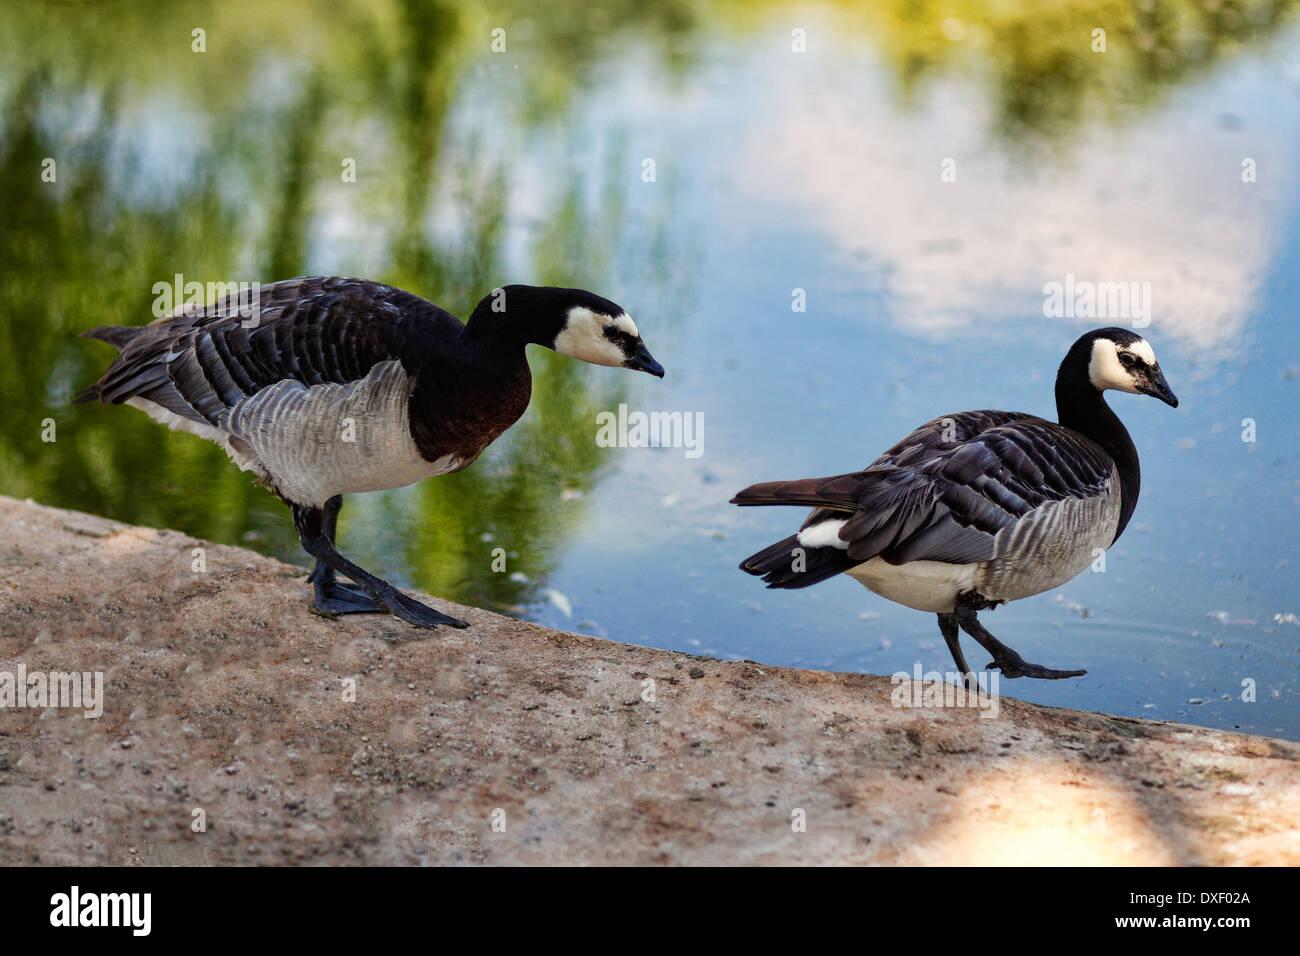 Belli Uccelli nel giardino zoologico Immagini Stock